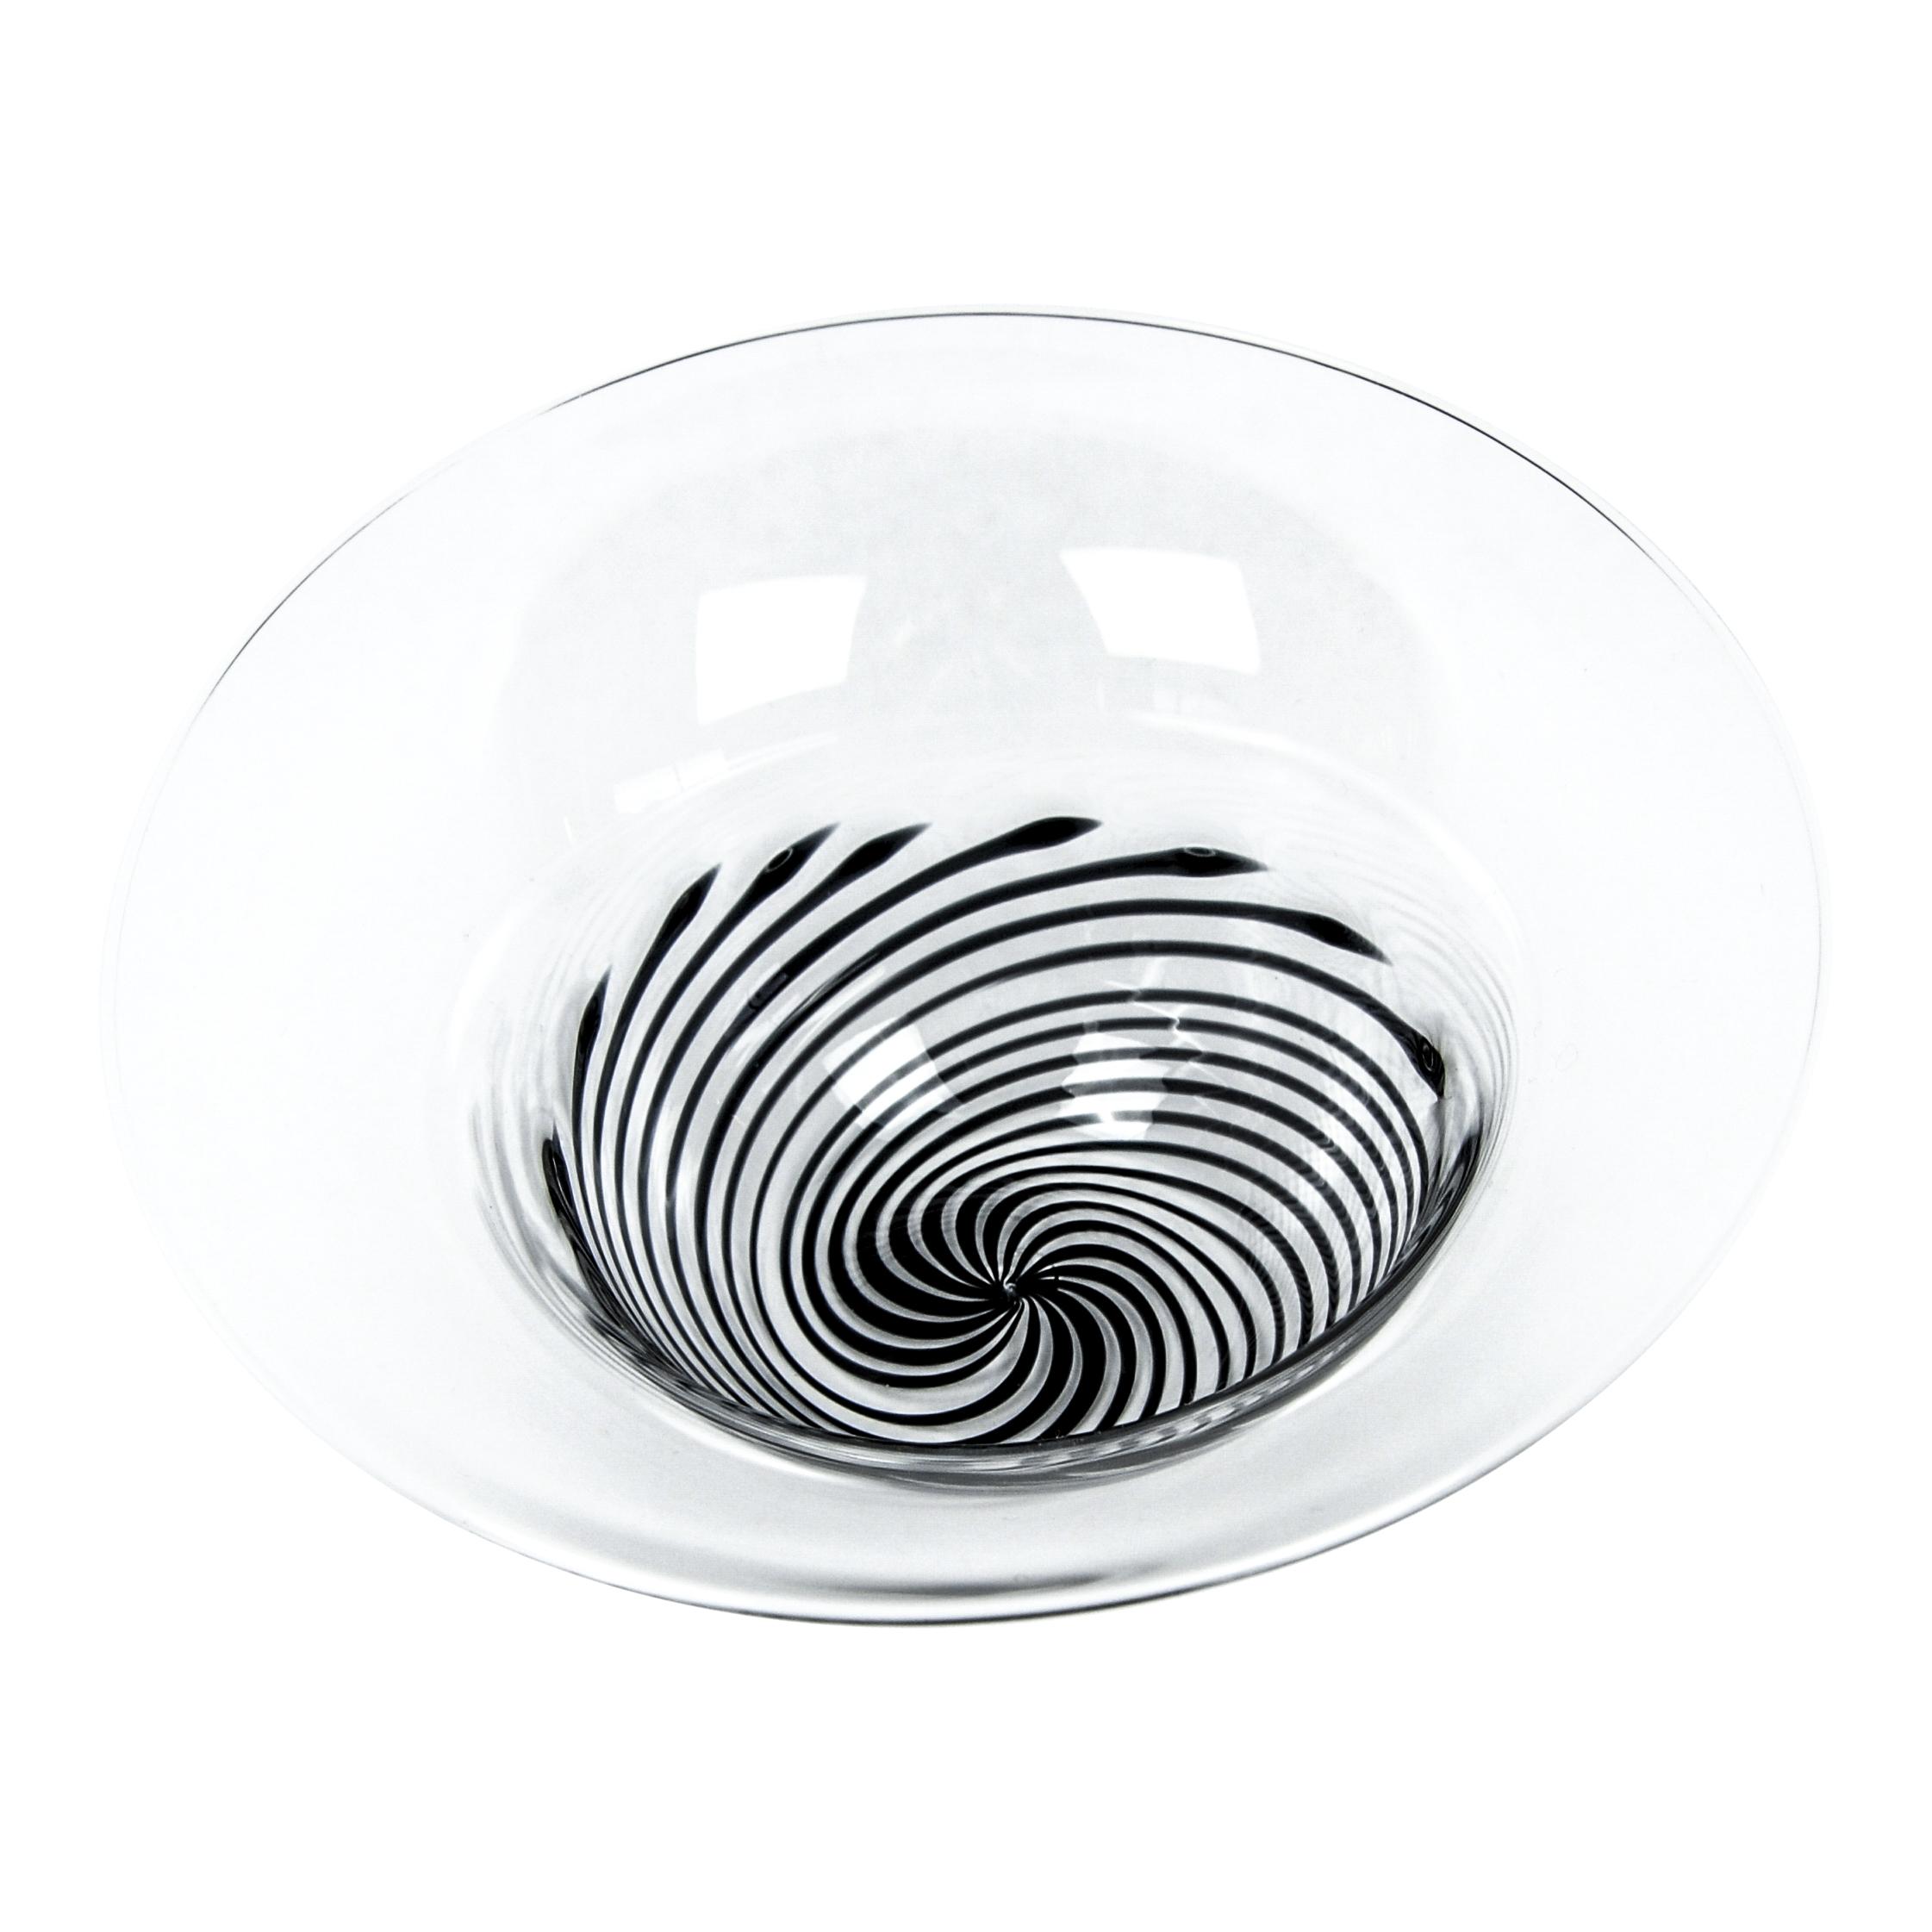 Dishes, bowls, glasses -